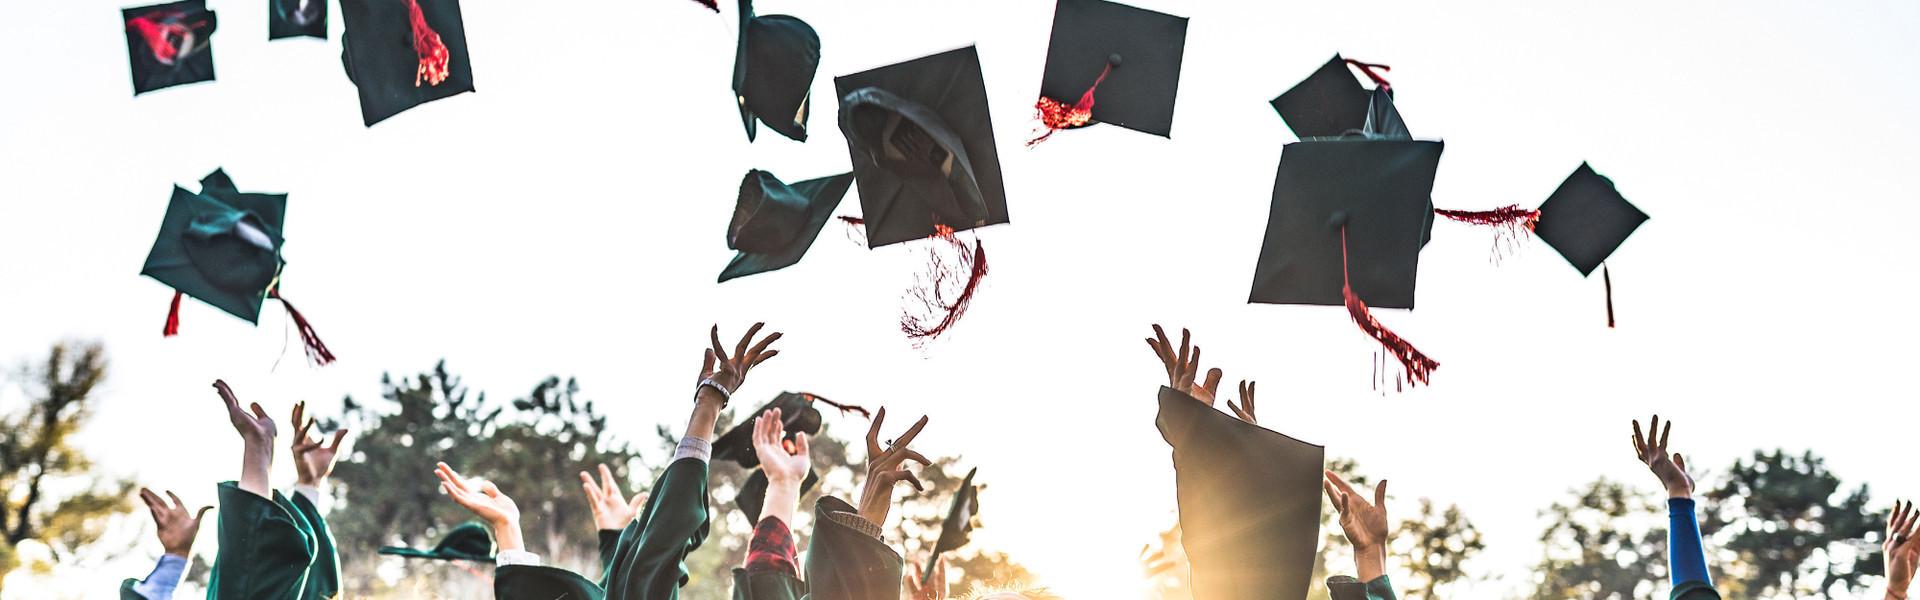 A Graduation Party Hotel Near Disney World - graduation